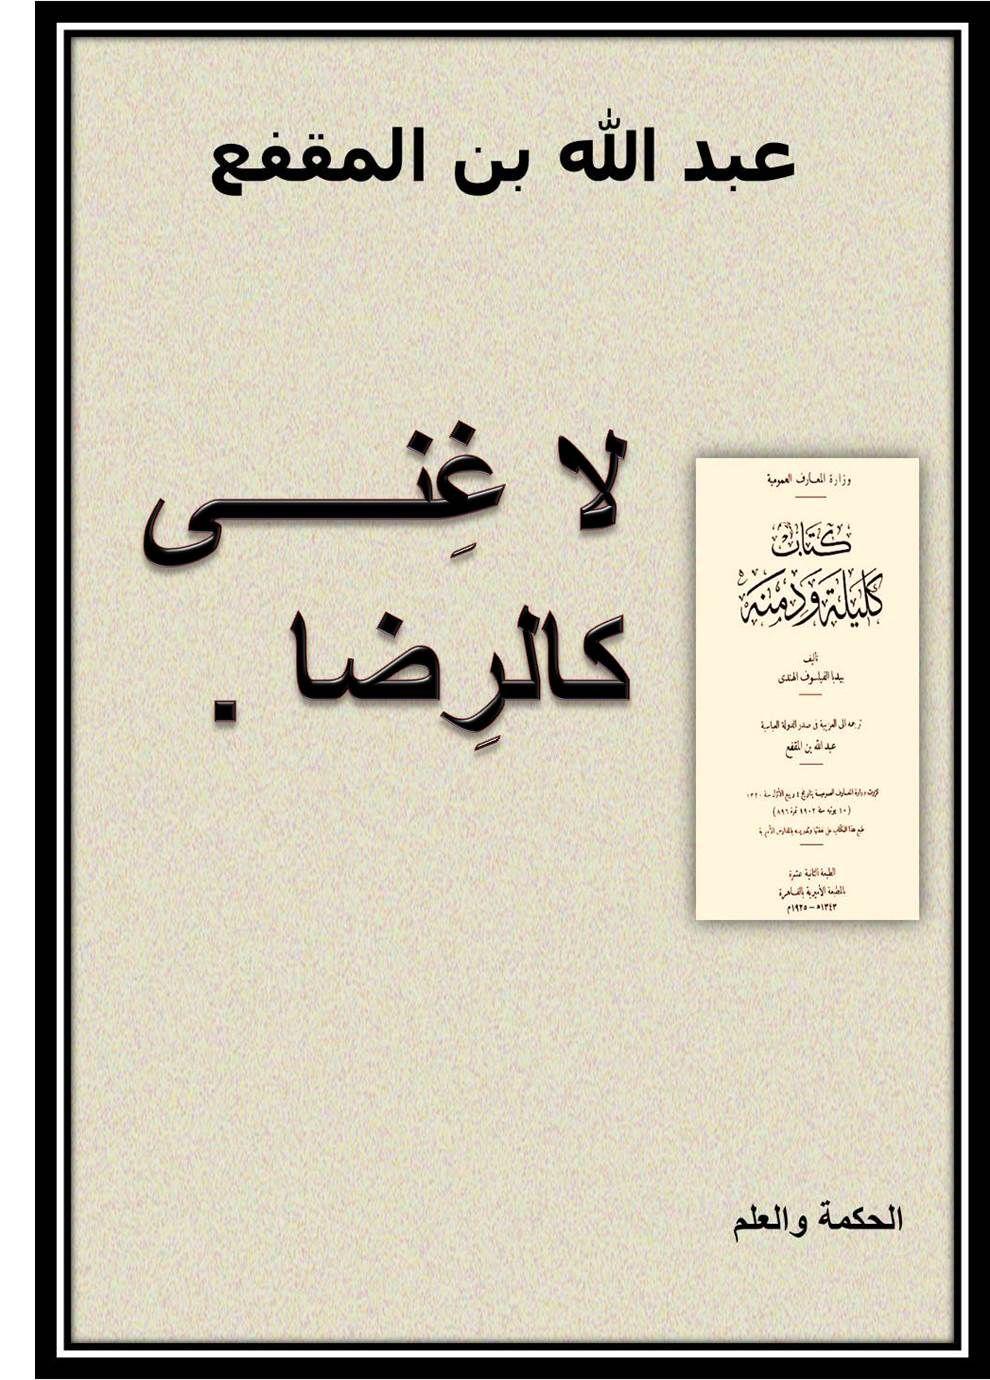 عبدالله بن المقفع لا غنى Arabic Calligraphy Quotes Calligraphy